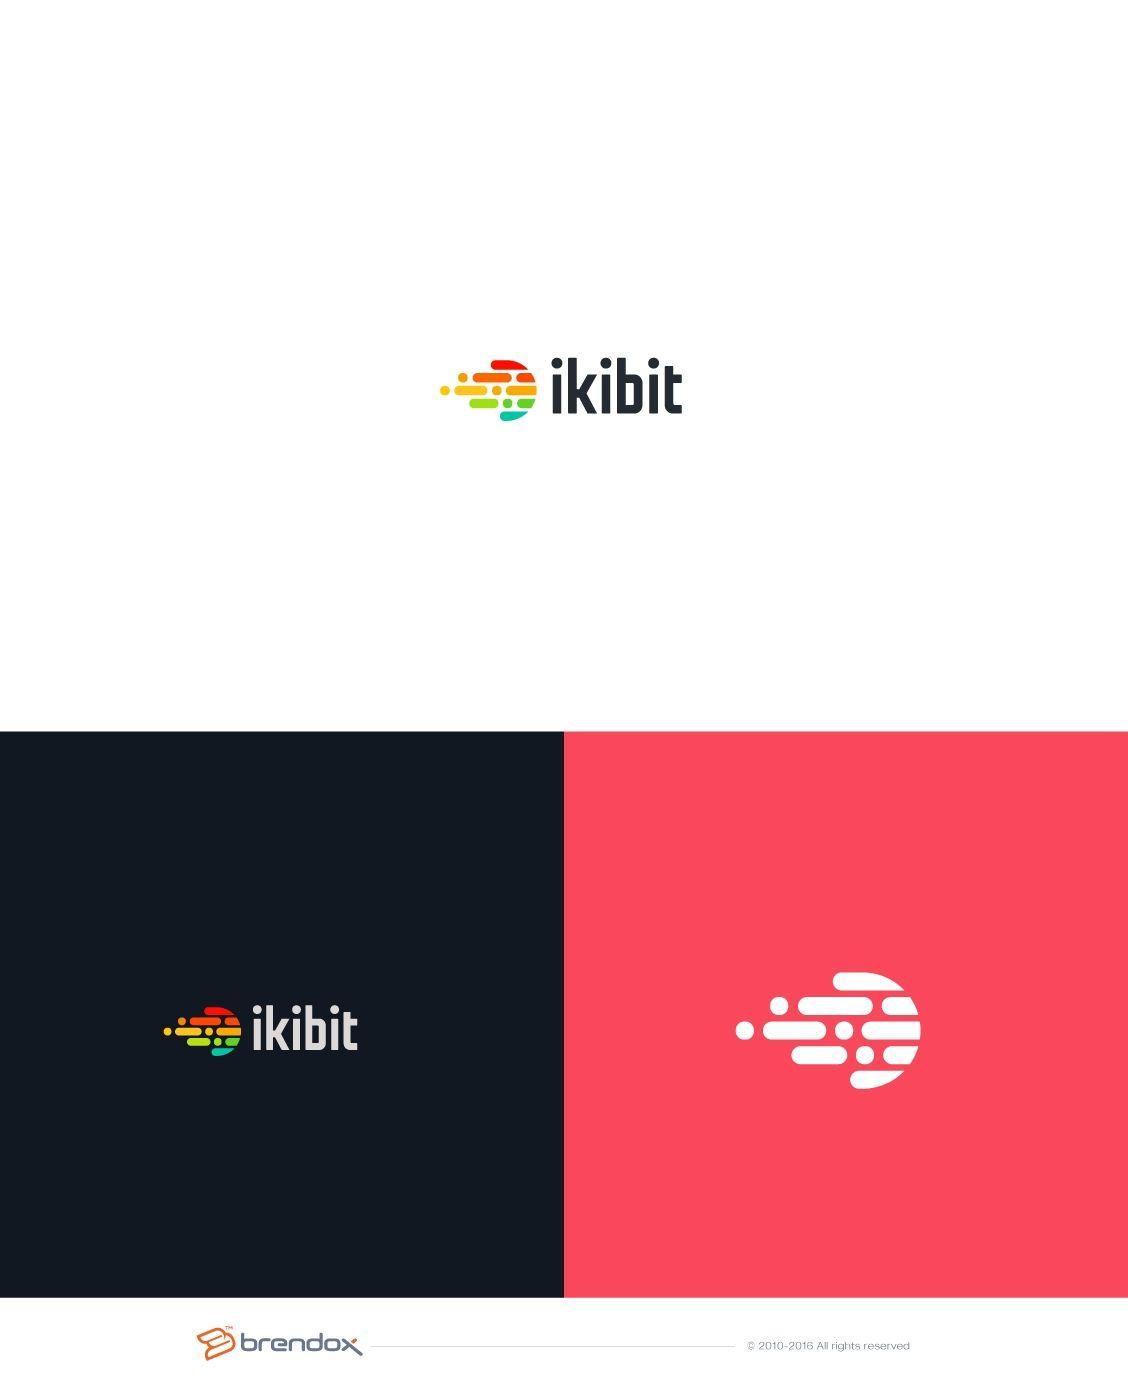 Design 153 By Brendox Logo For Ikibit Software Company Logo Design Logo Design Contest Consulting Logo